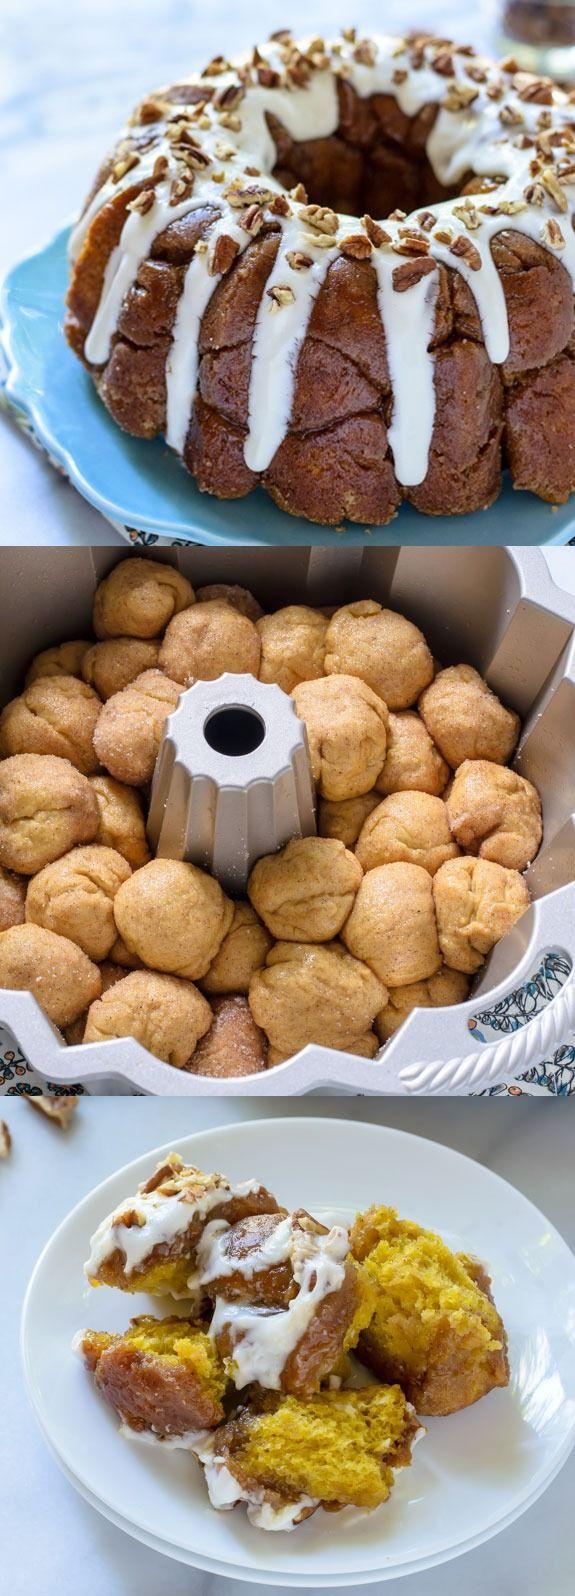 ... cinnamon work cinnamon sugar cinn muffin cinnamon sheilah j ratliff